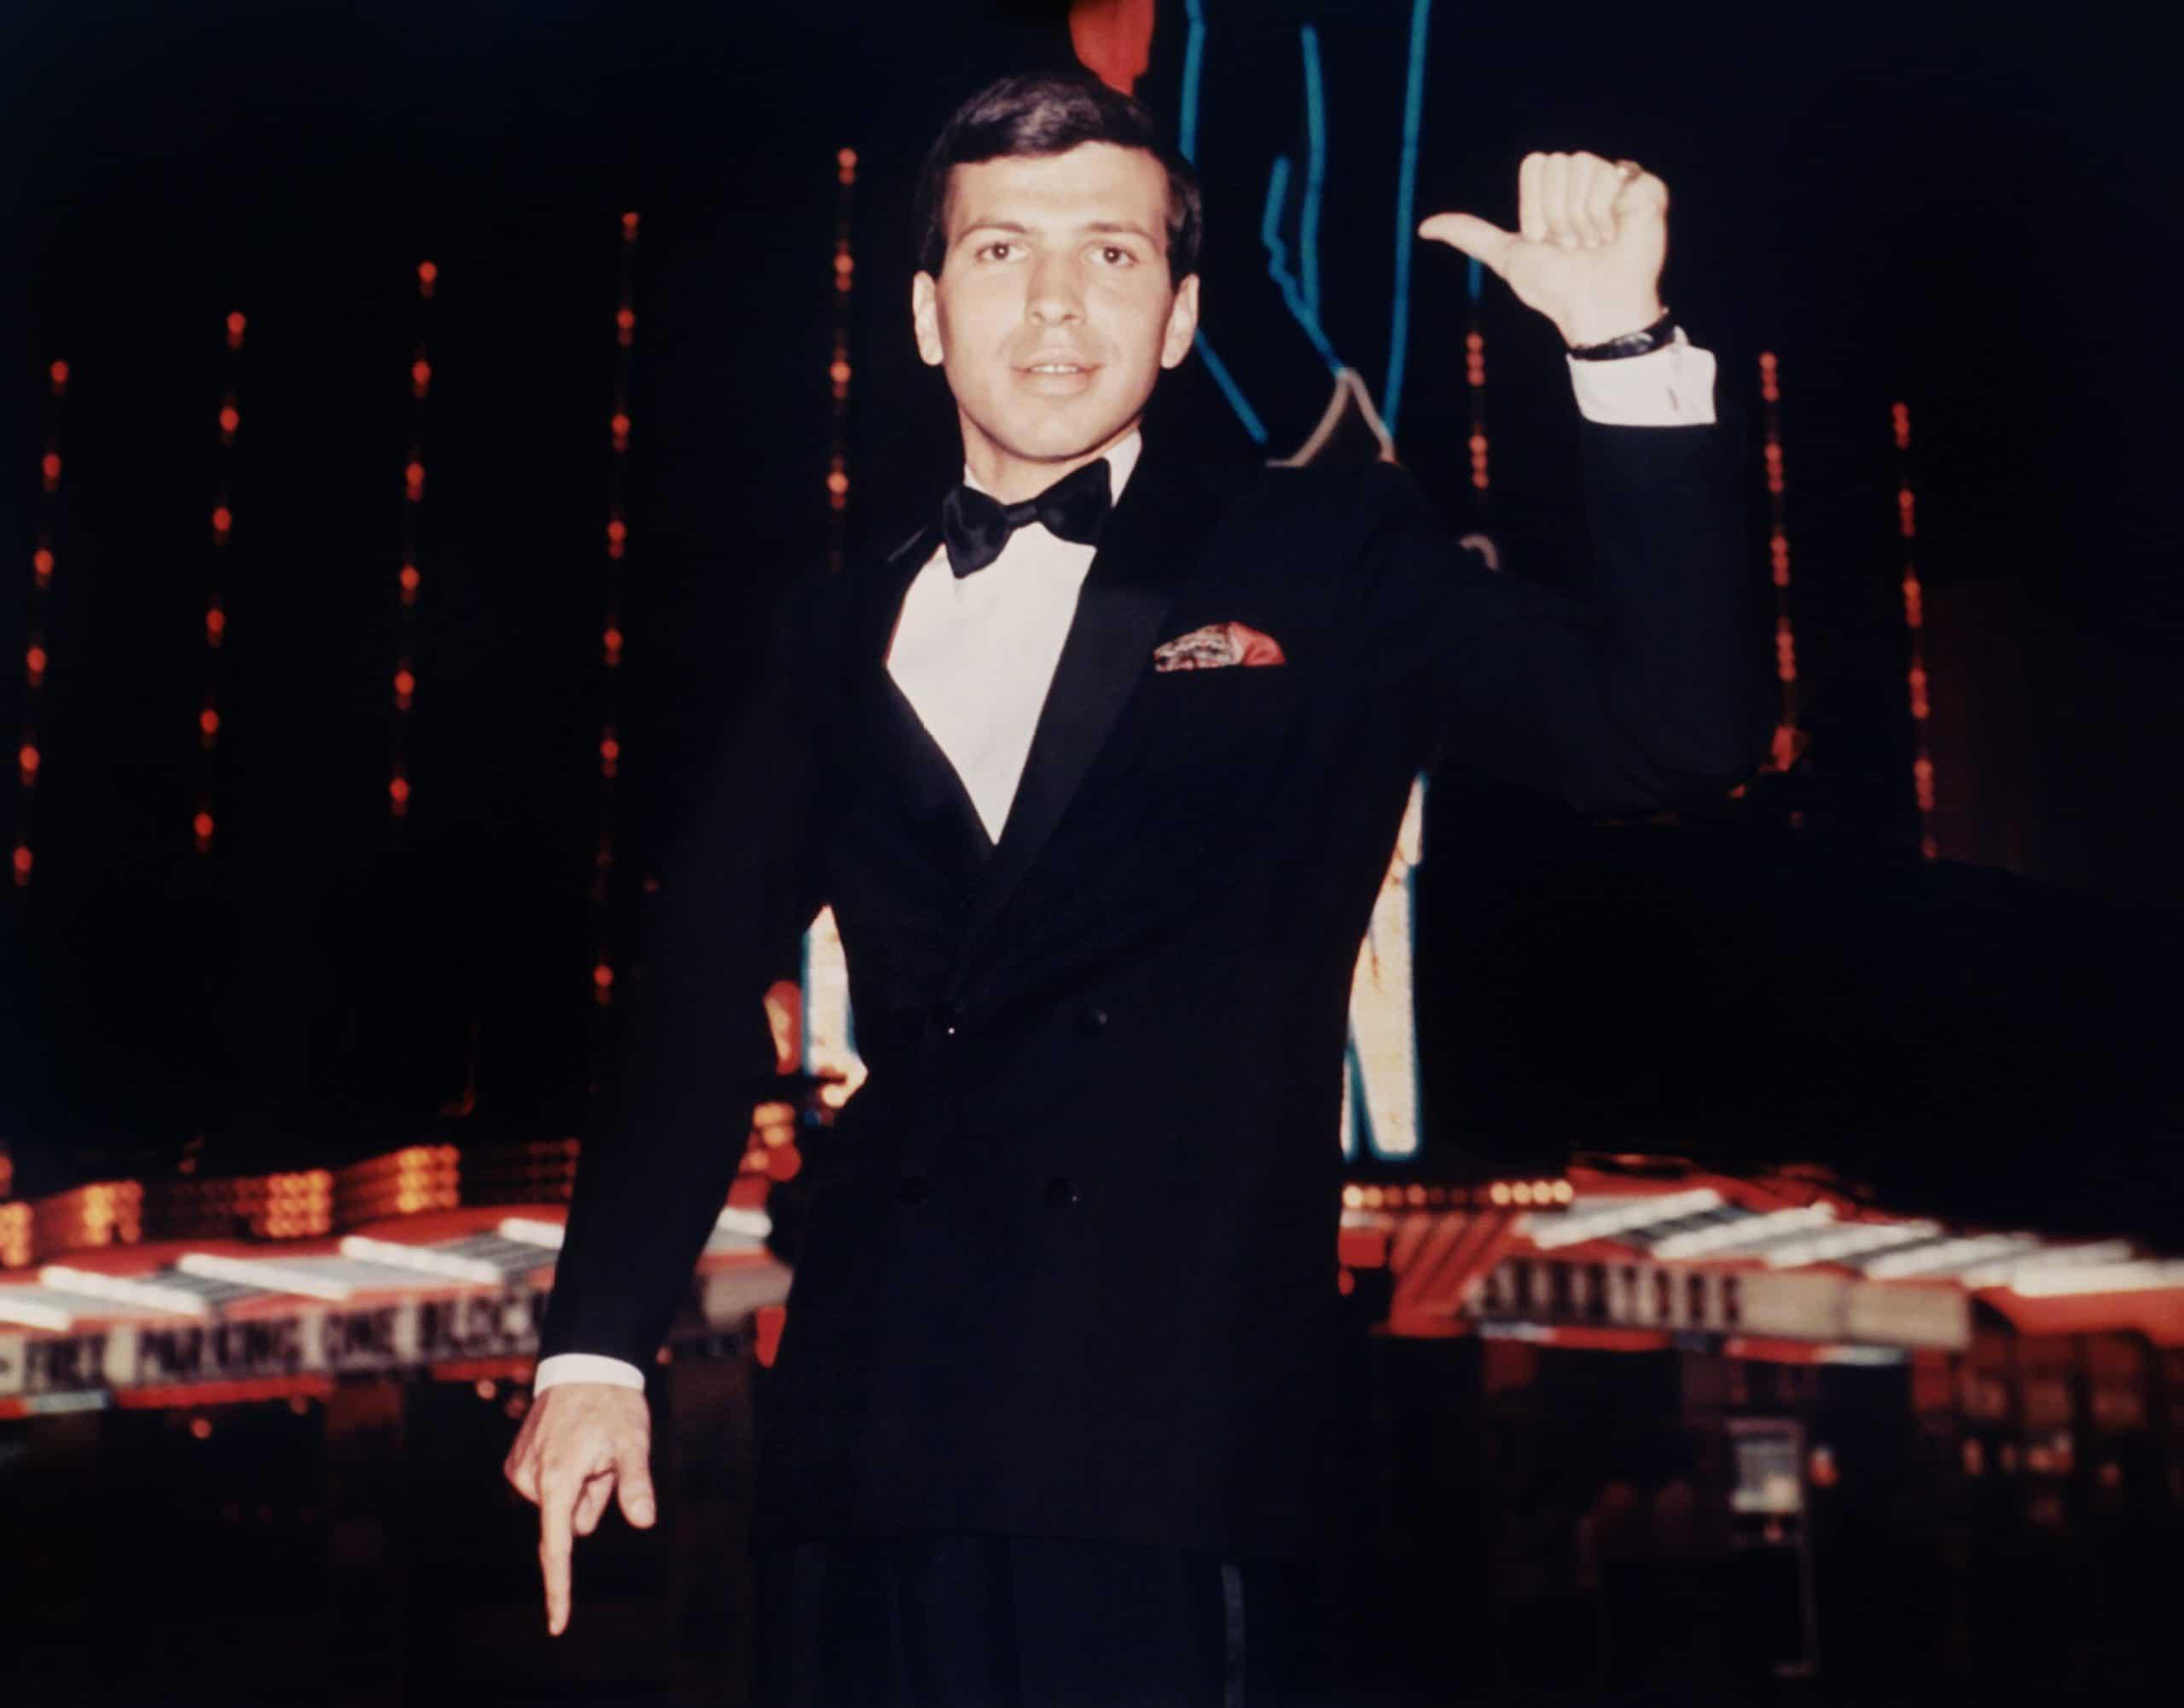 FRANK SINATRA JR. WITH FAMILY AND FRIENDS, Frank Sinatra Jr., 1969